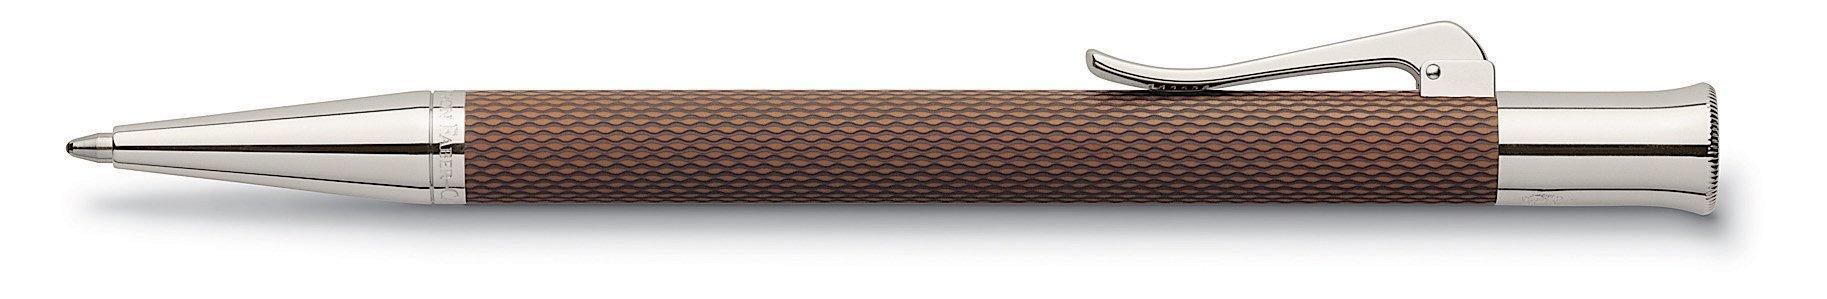 GRAF von Faber-Castell Guilloche Propelling Pencil - Cognac